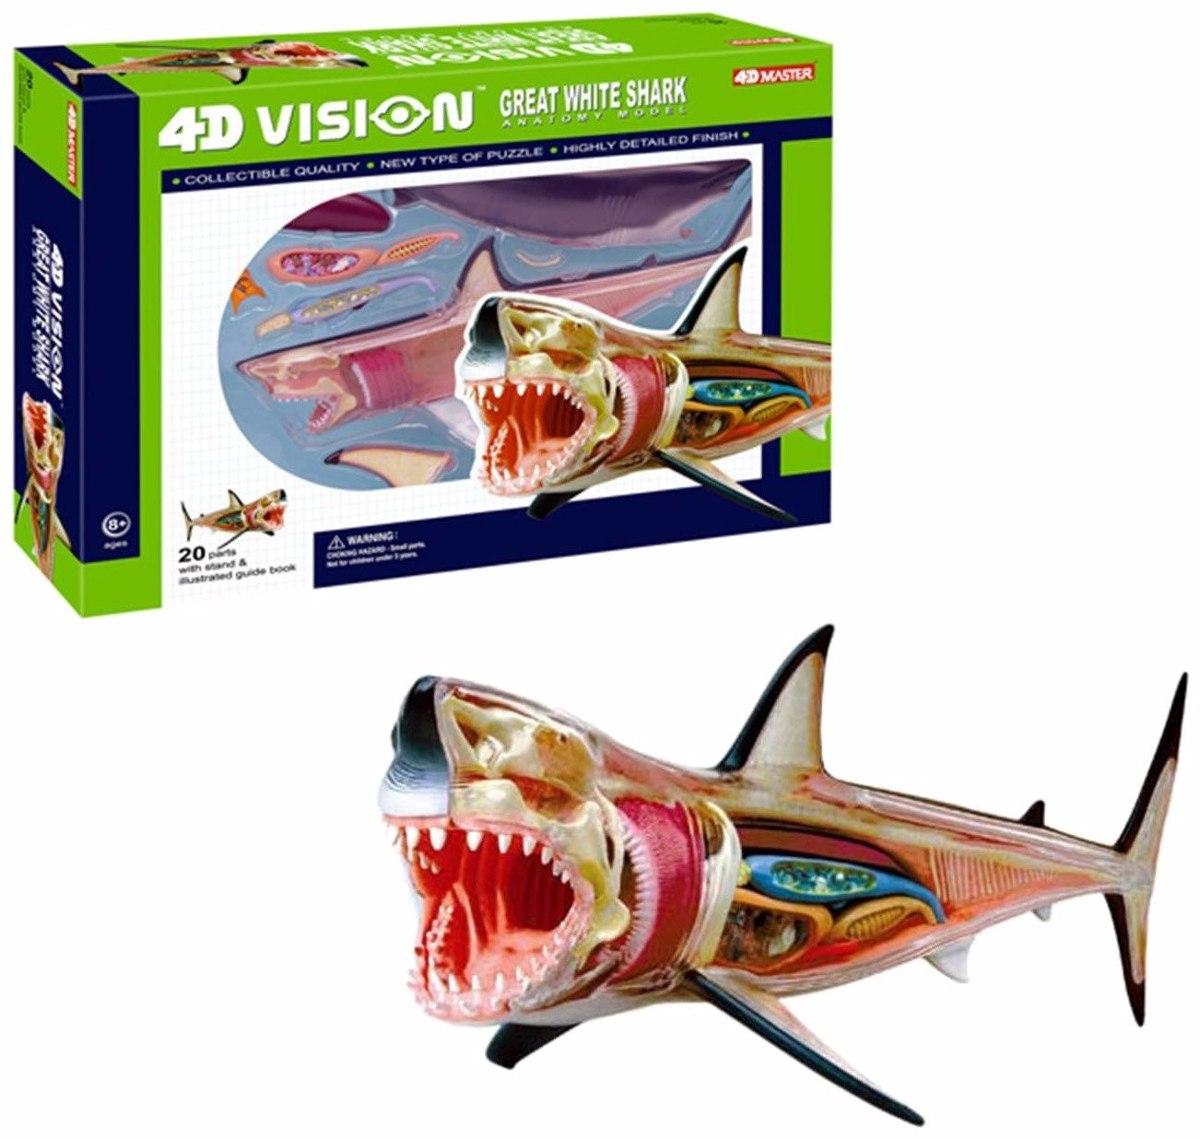 Esqueleto Anatomia De Tiburon Blanco Realista 4d